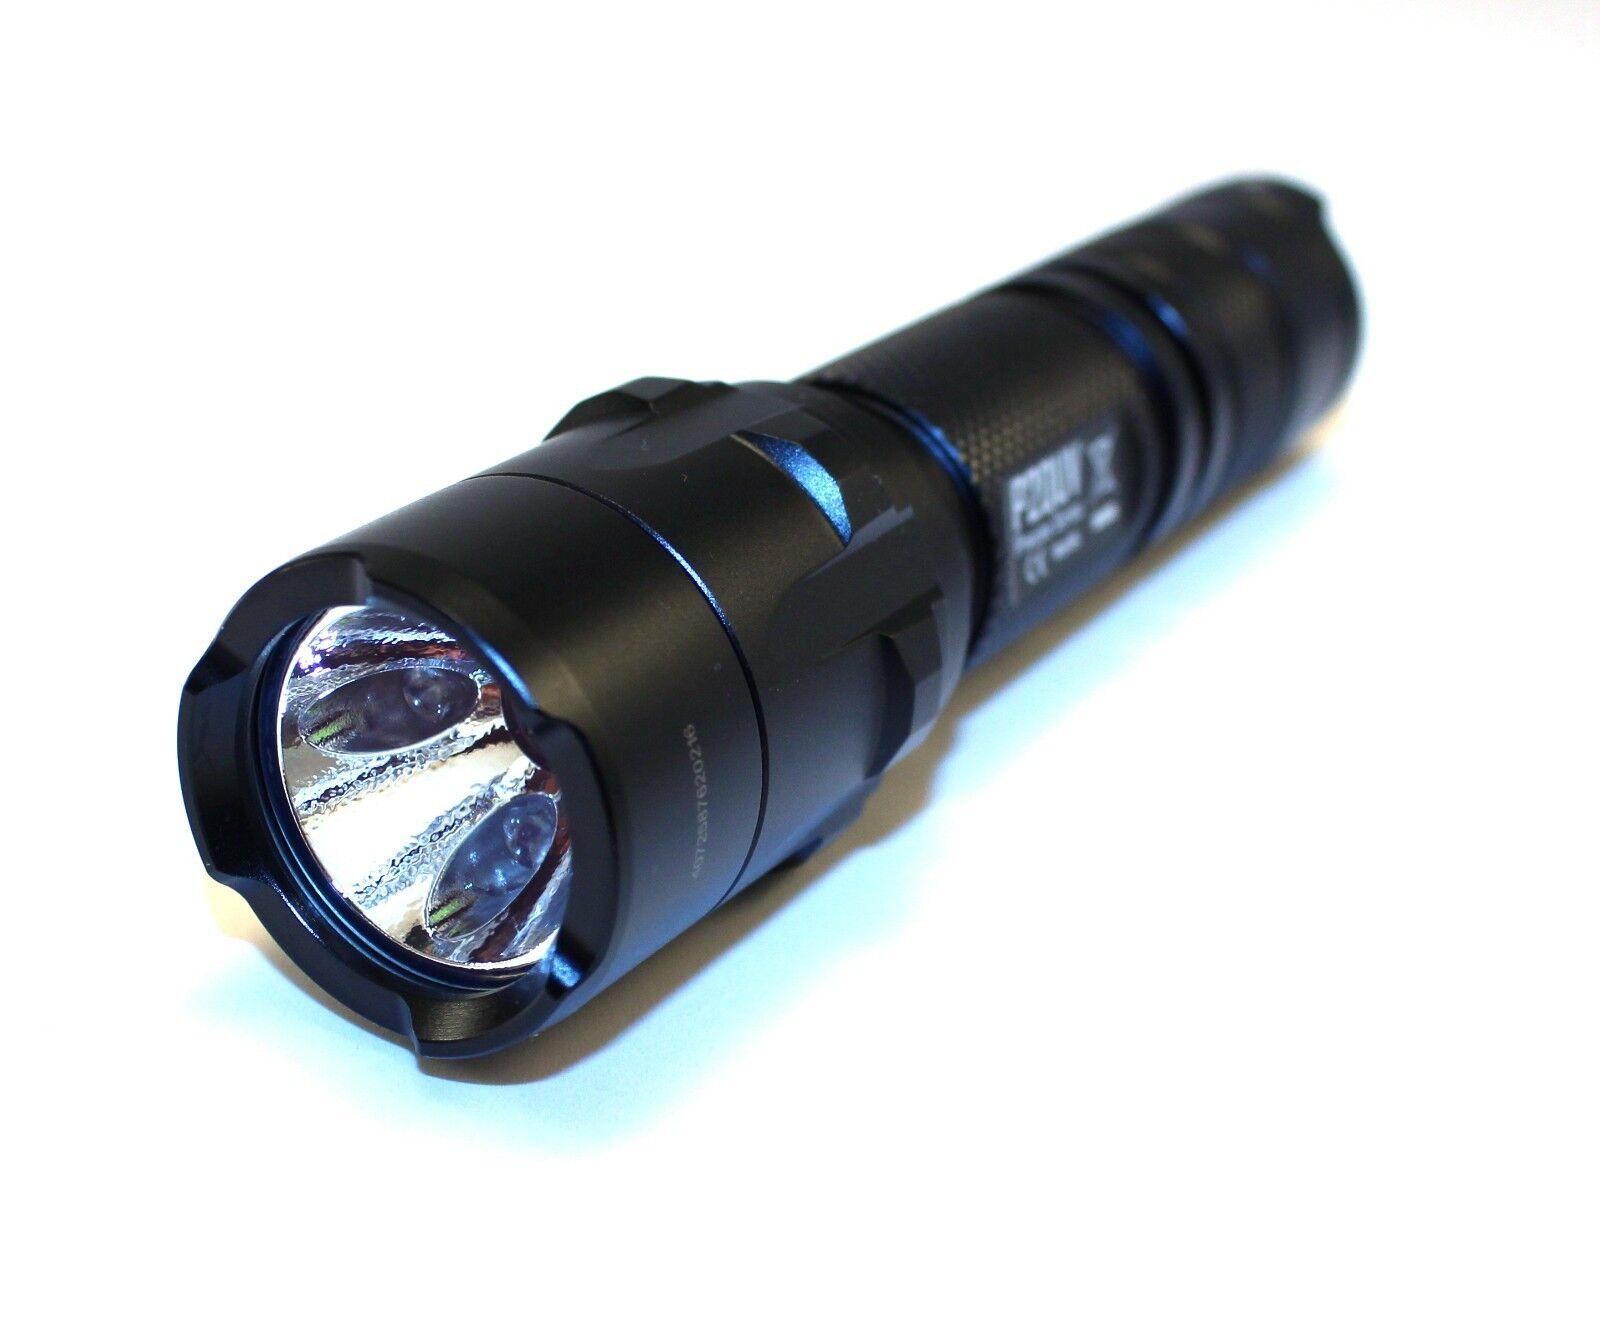 Nitecore P20UV Flashlight, Police, Security, Search & Rescue, MOD, Ultra Violet